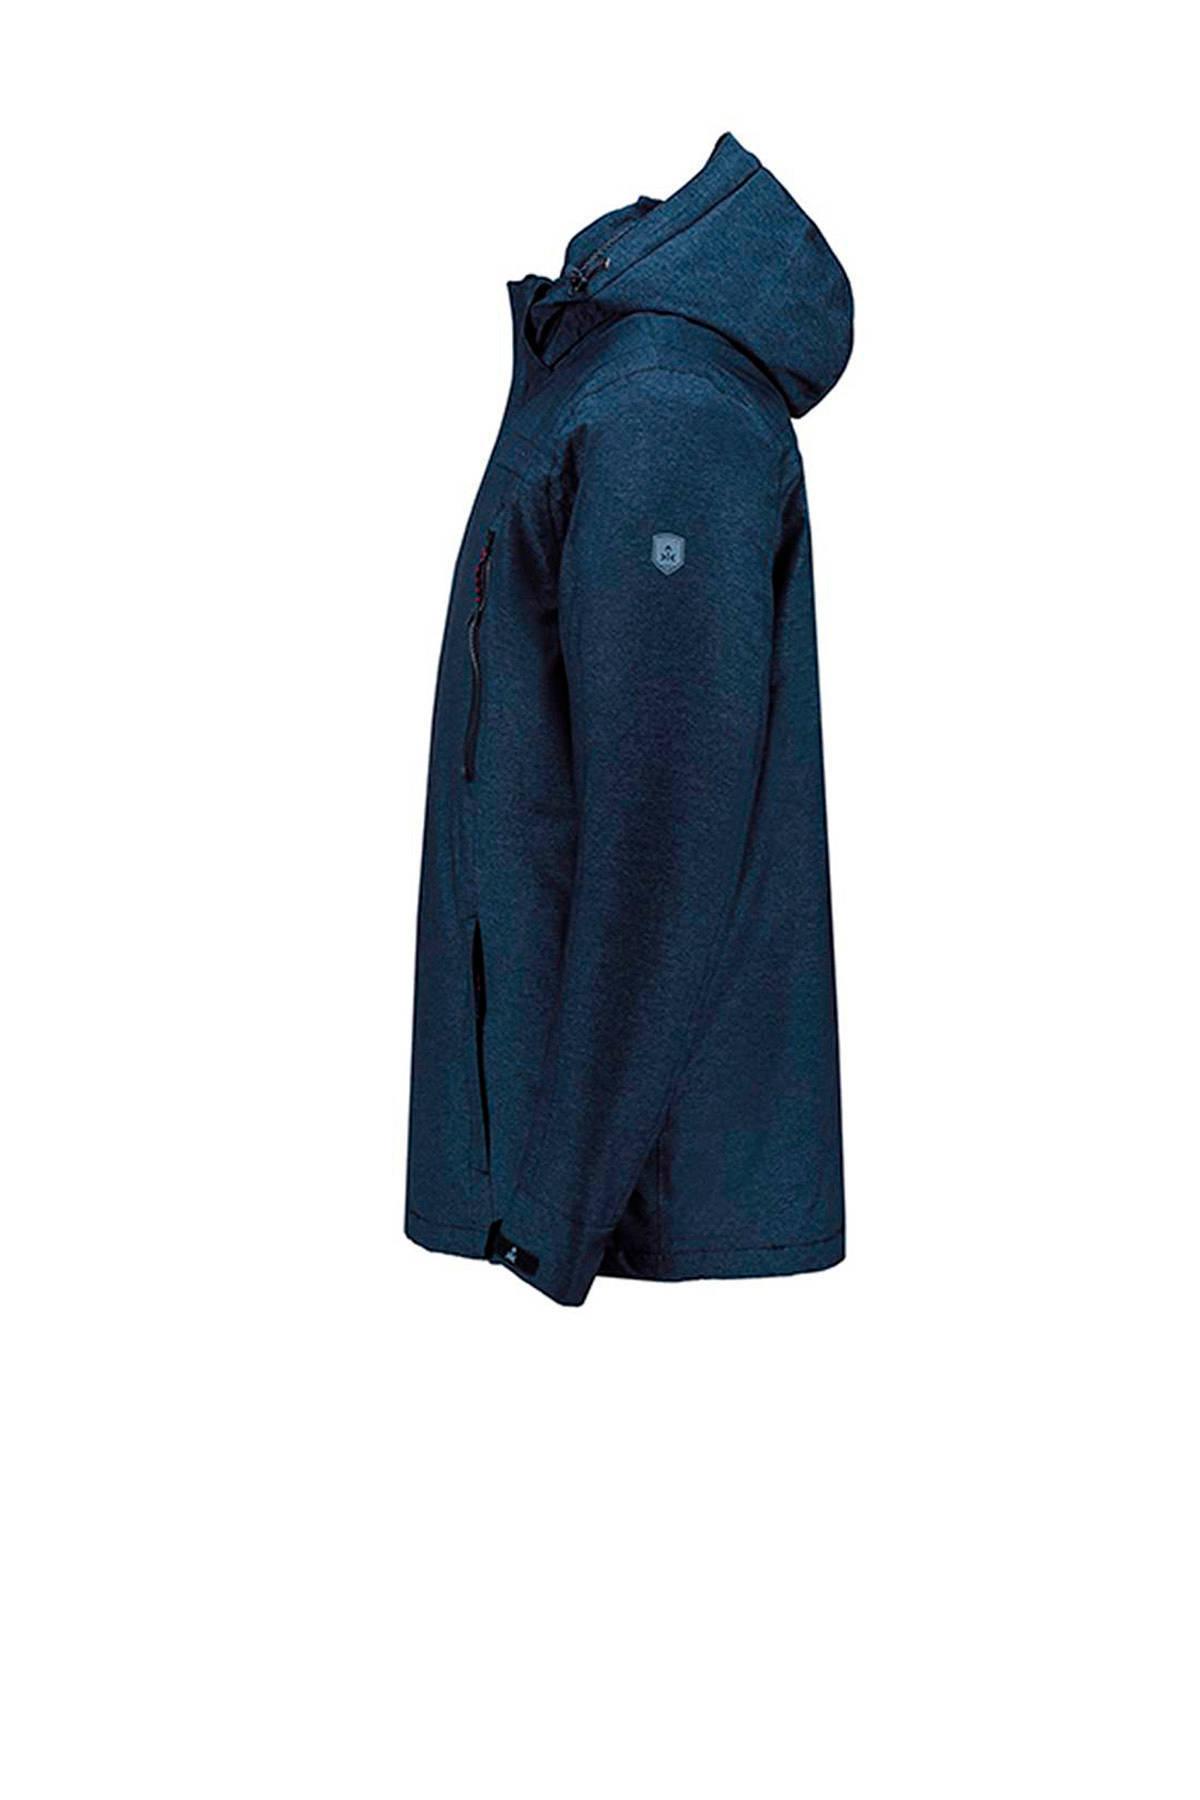 Kjelvik outdoor jas outdoor Lorkin donkerblauw Lorkin donkerblauw Kjelvik Kjelvik jas txqwBnY6A